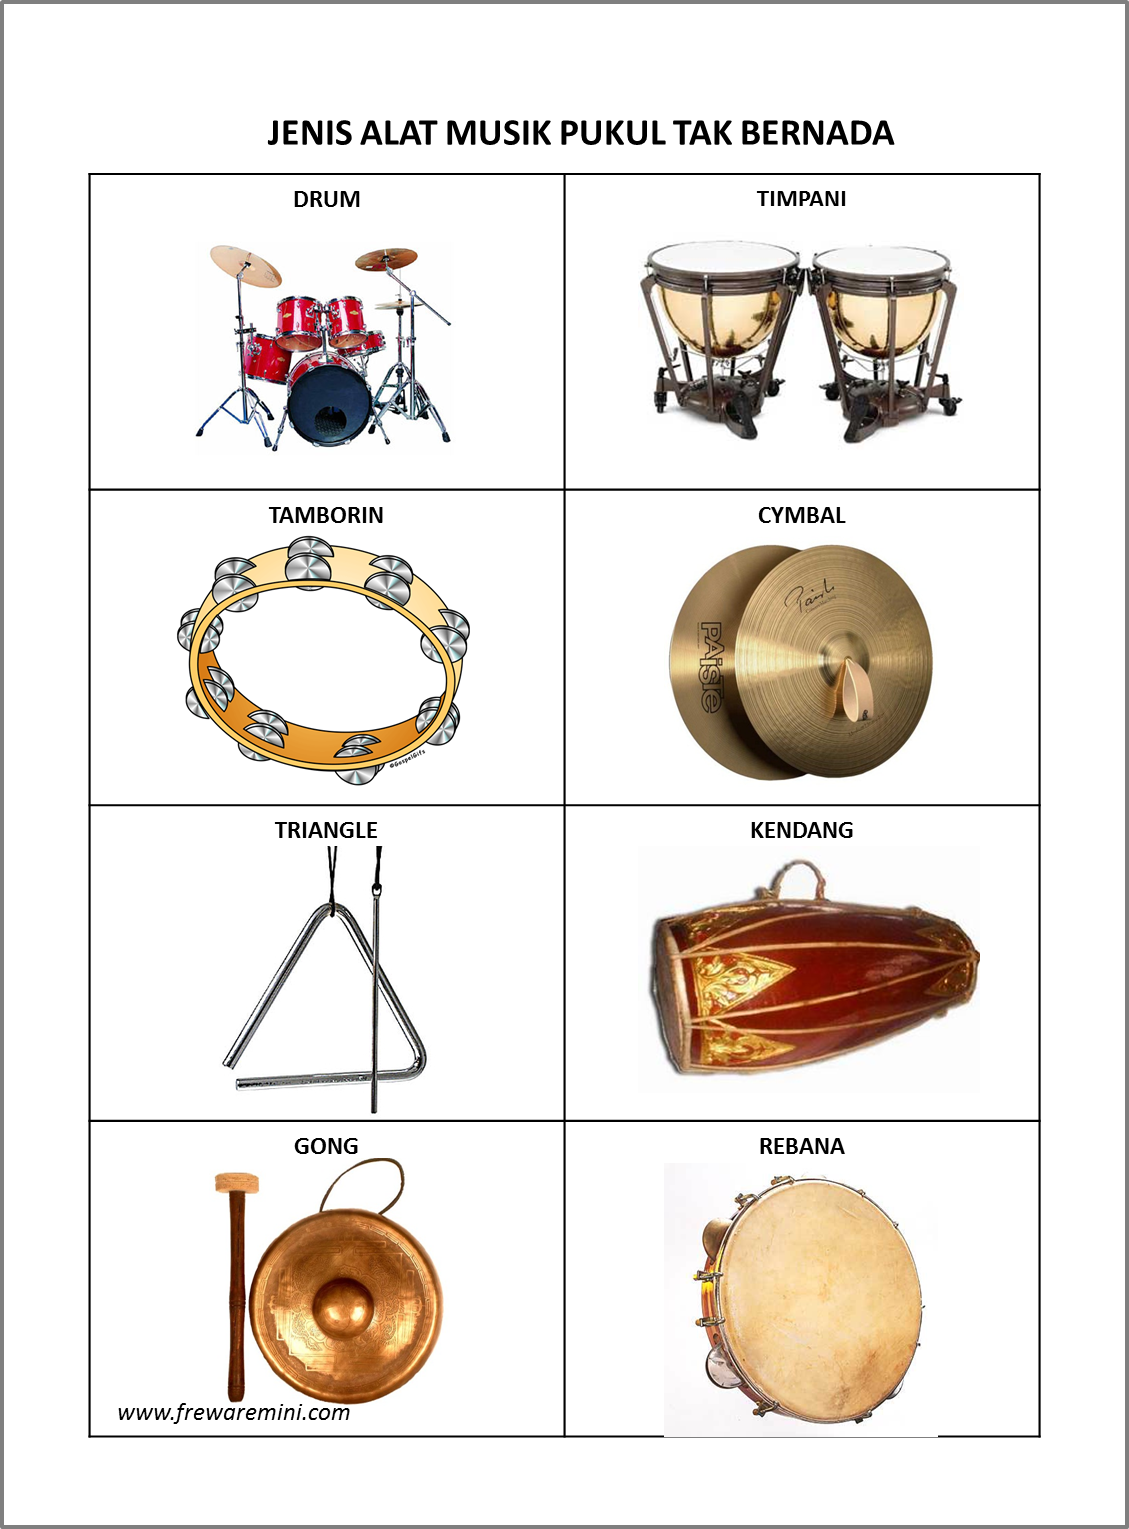 95+ Gambar Alat Musik Tamborin